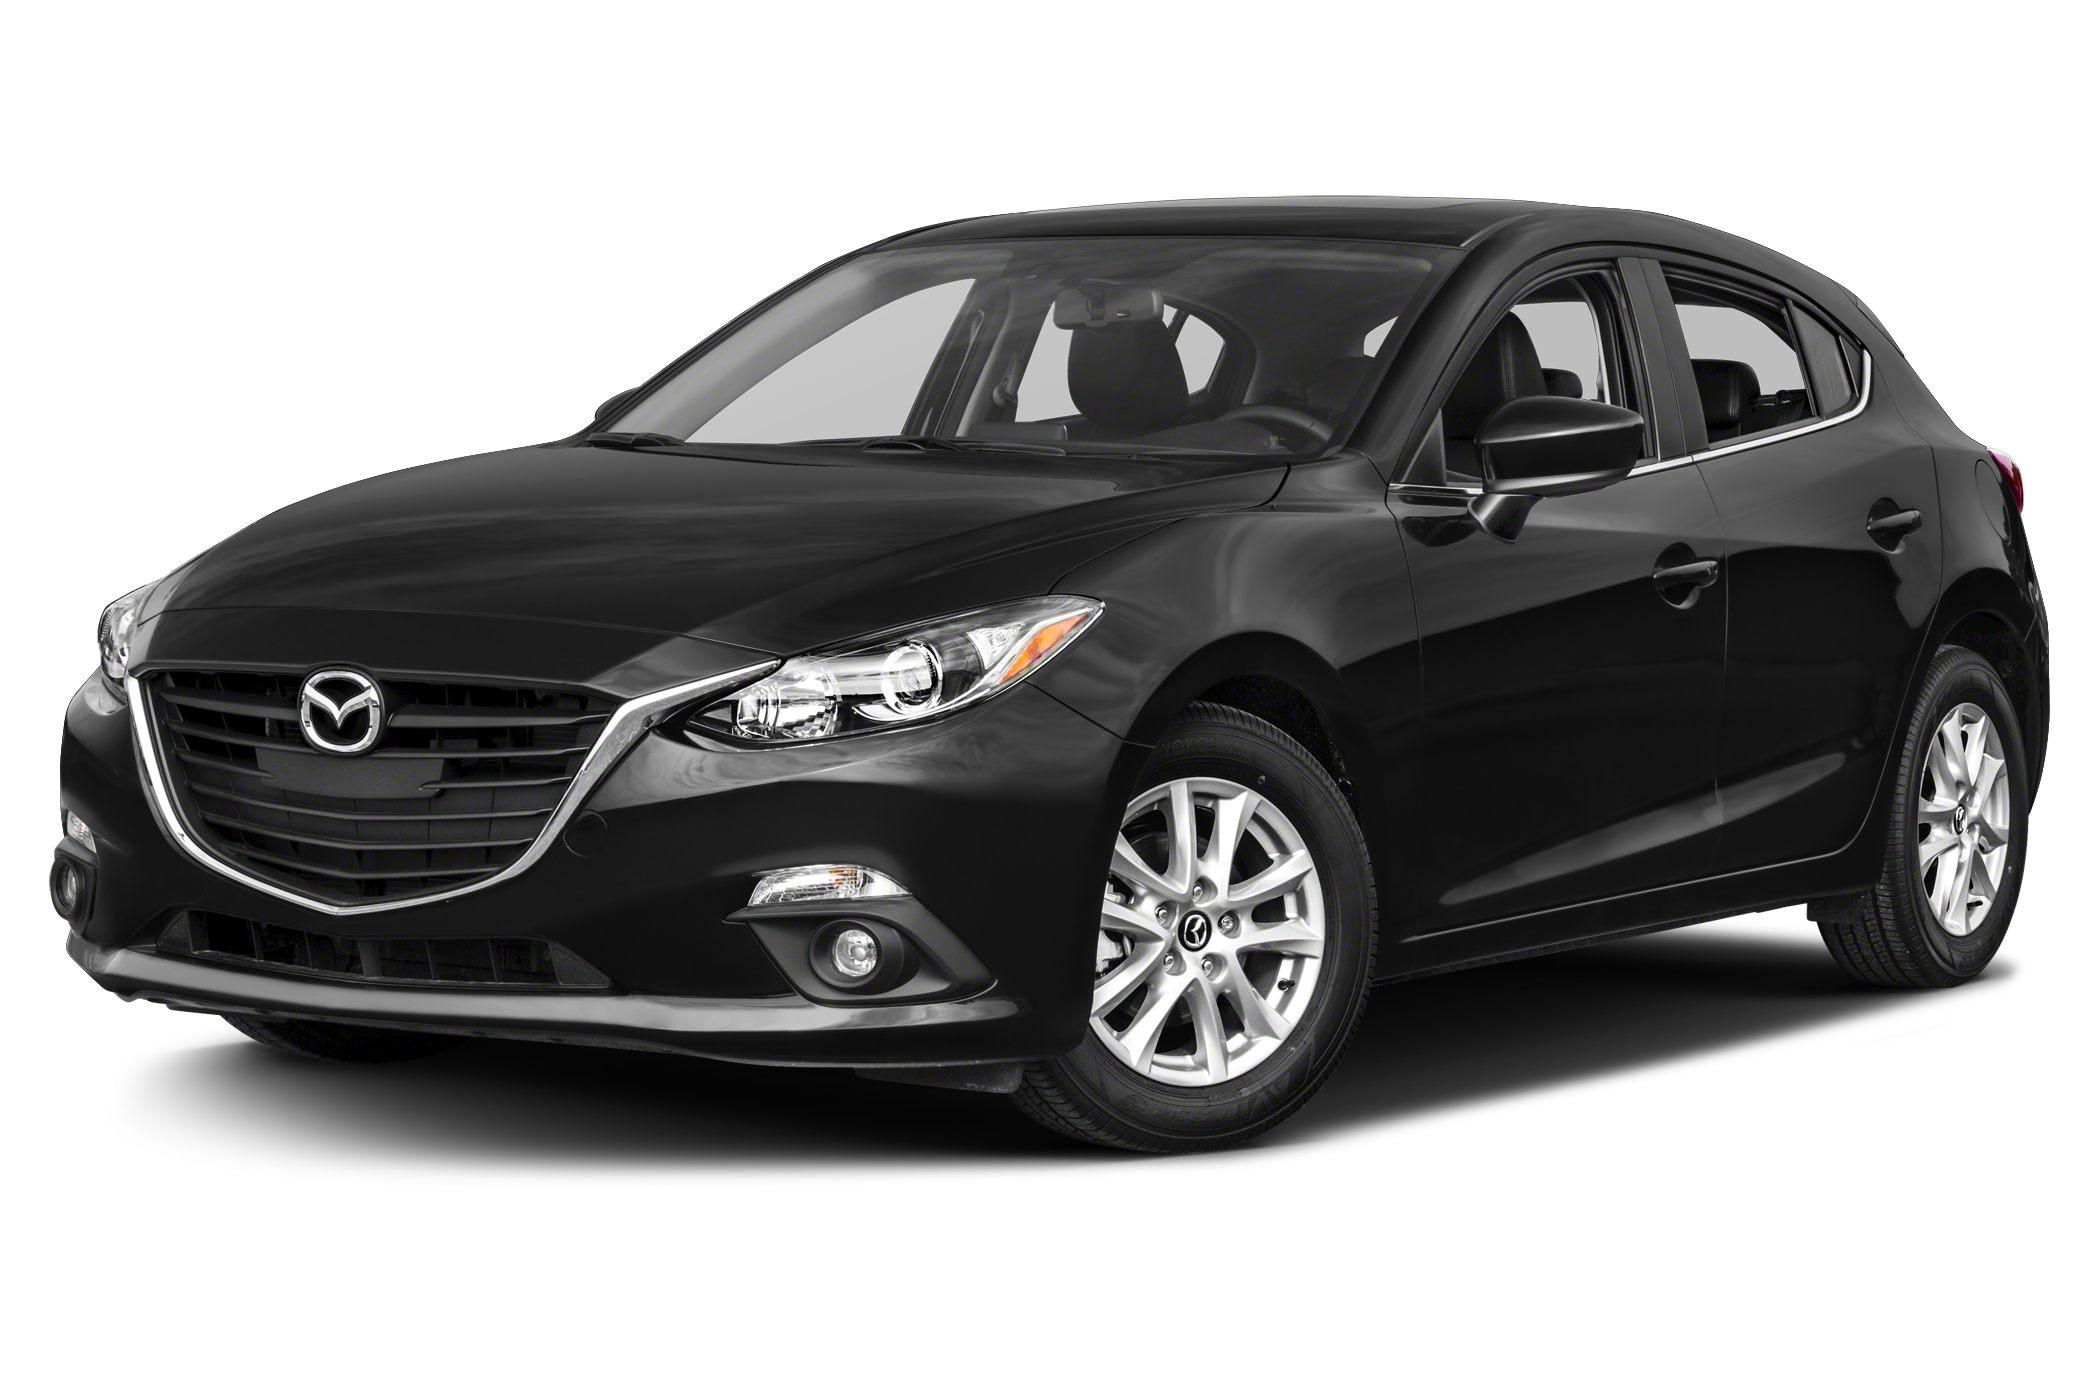 Kelebihan Mazda 3 2016 Hatchback Perbandingan Harga